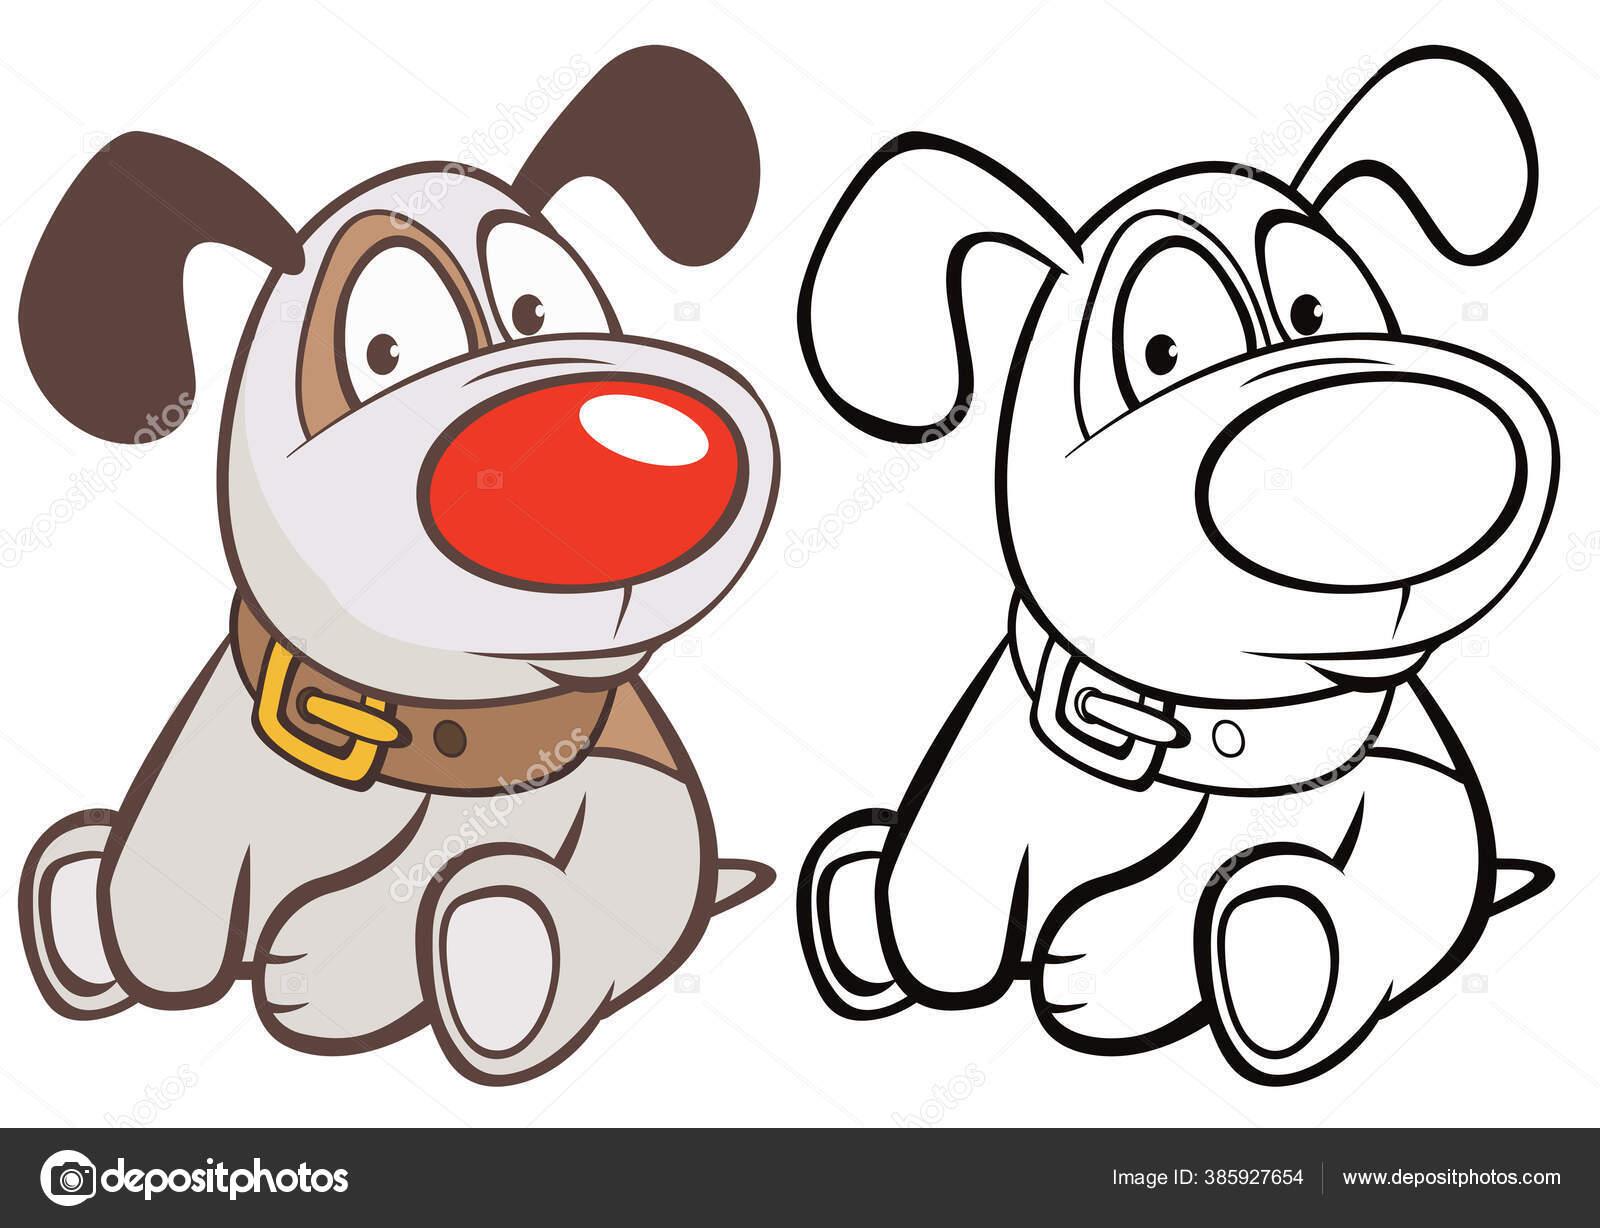 Vector Illustration Cute Cartoon Character Hunting Dog You Design Computer Stok Vektor C Liusaart 385927654